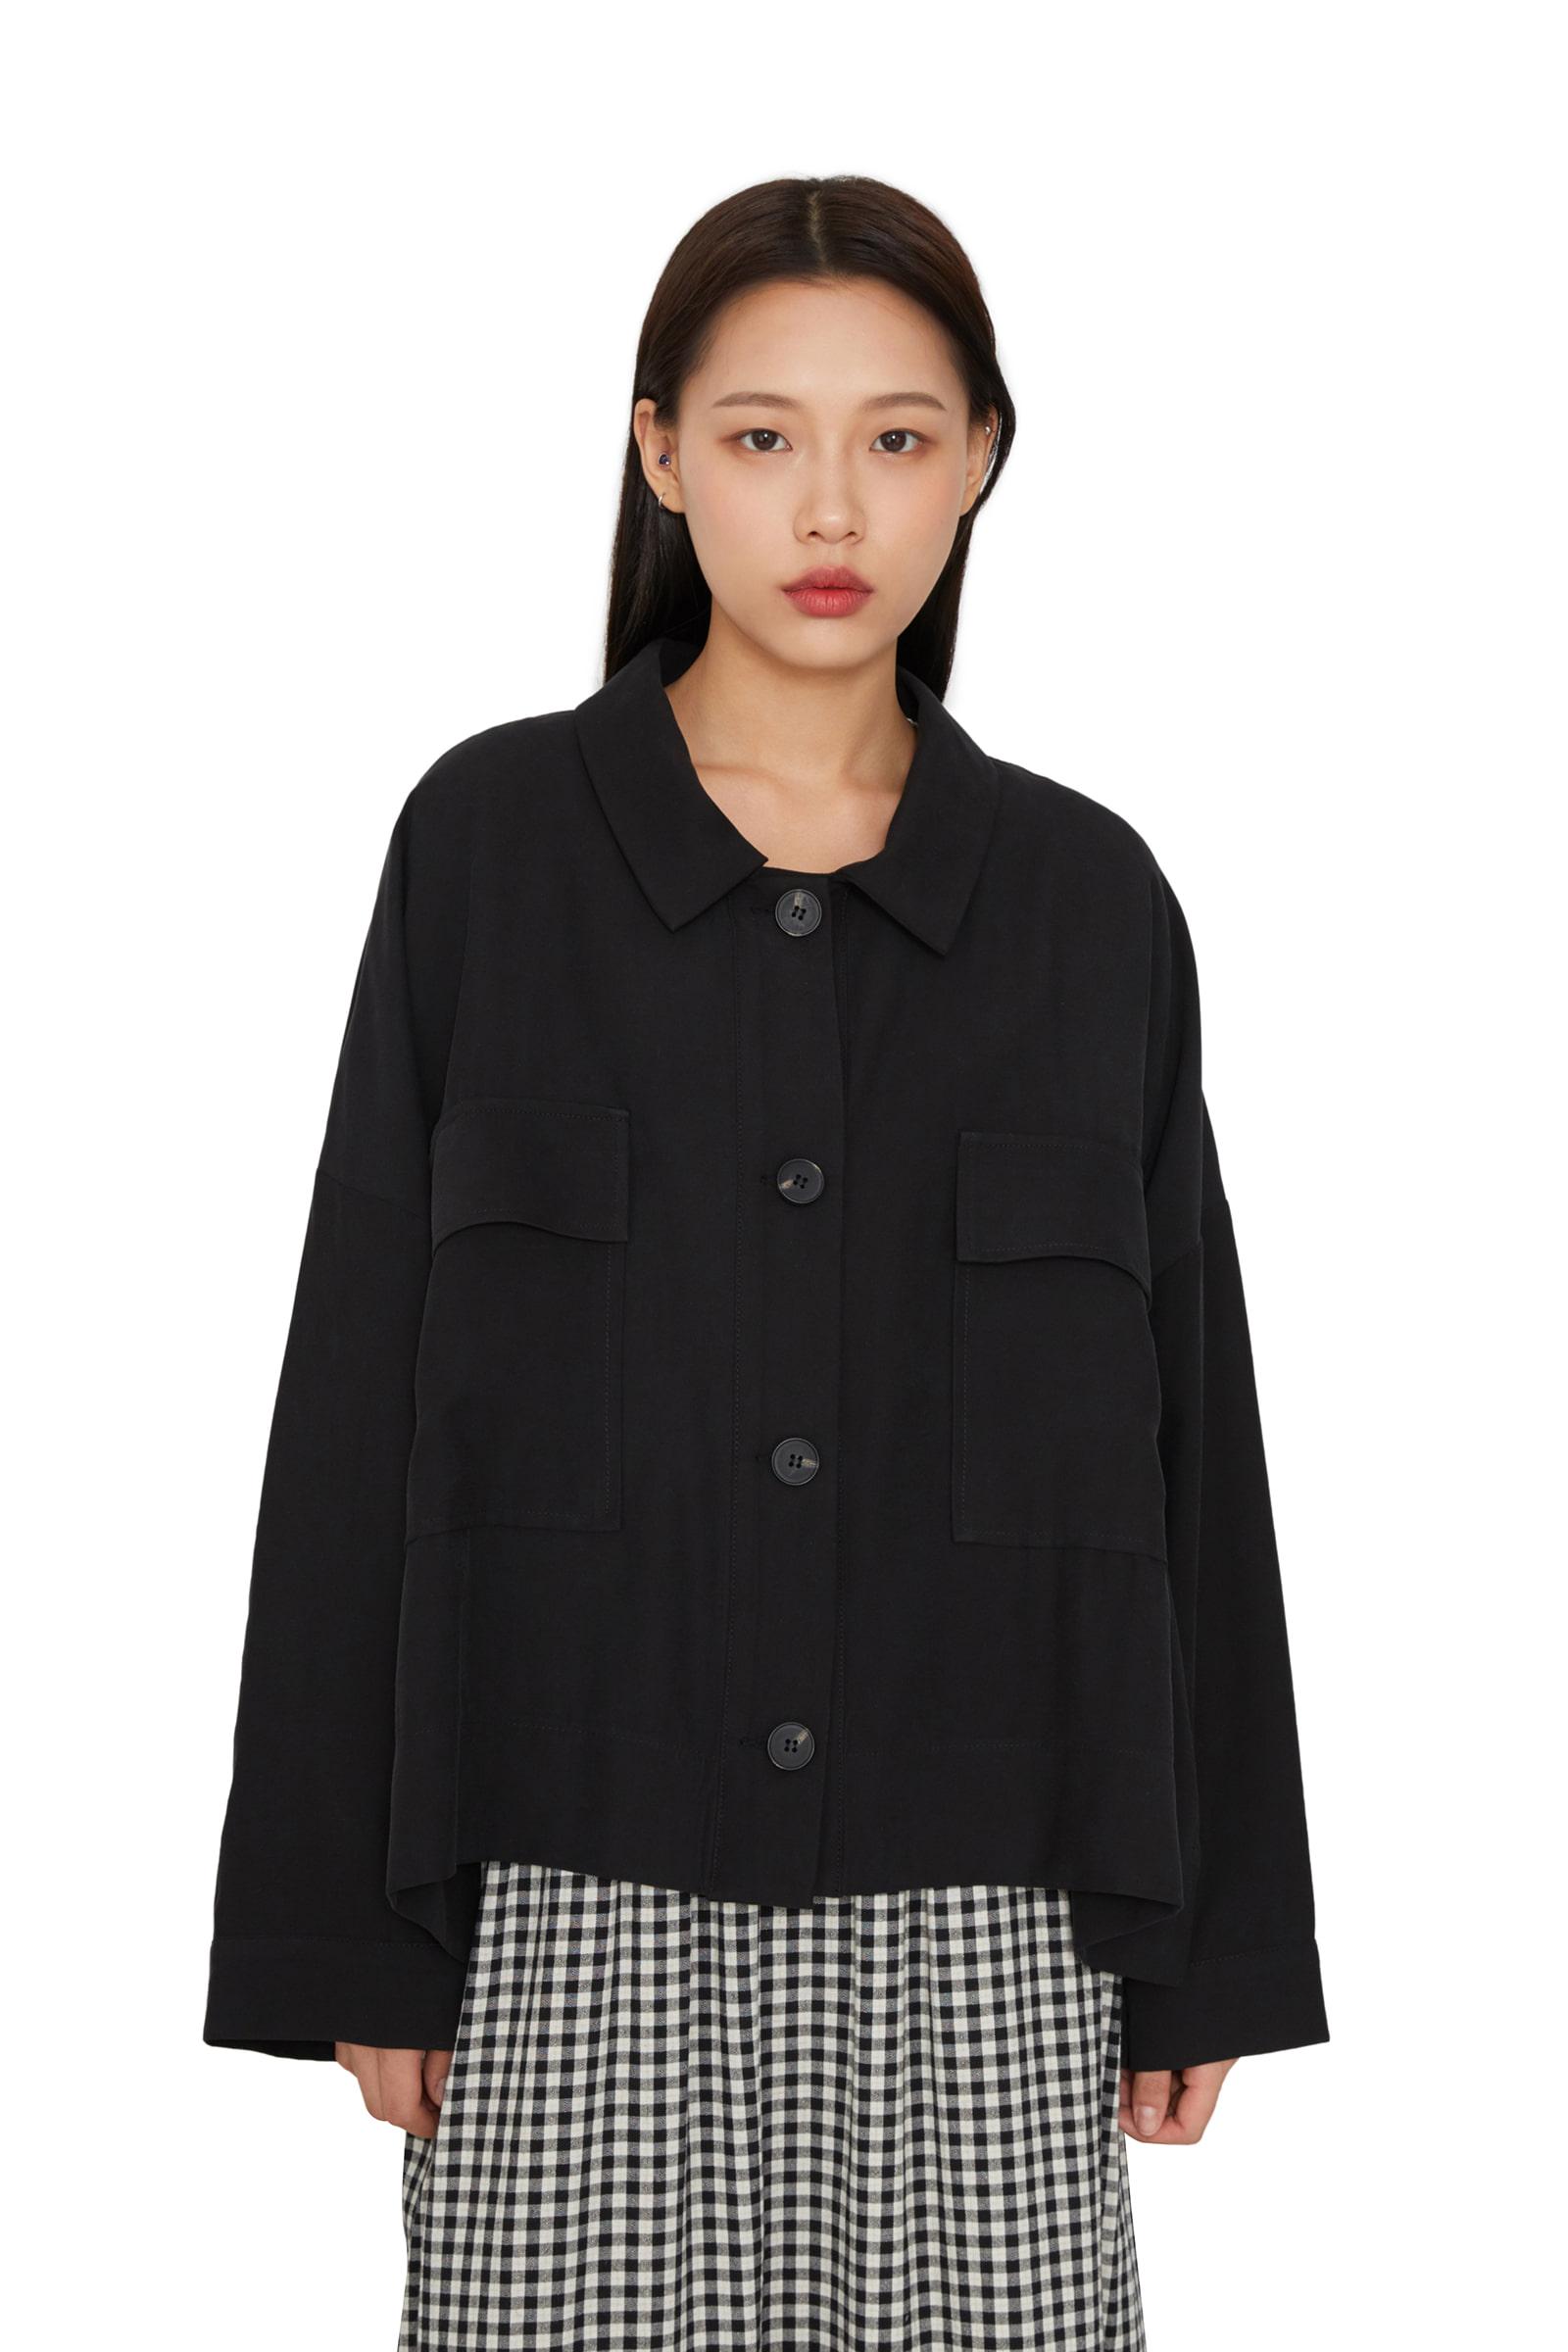 Lazy flap pocket casual jacket